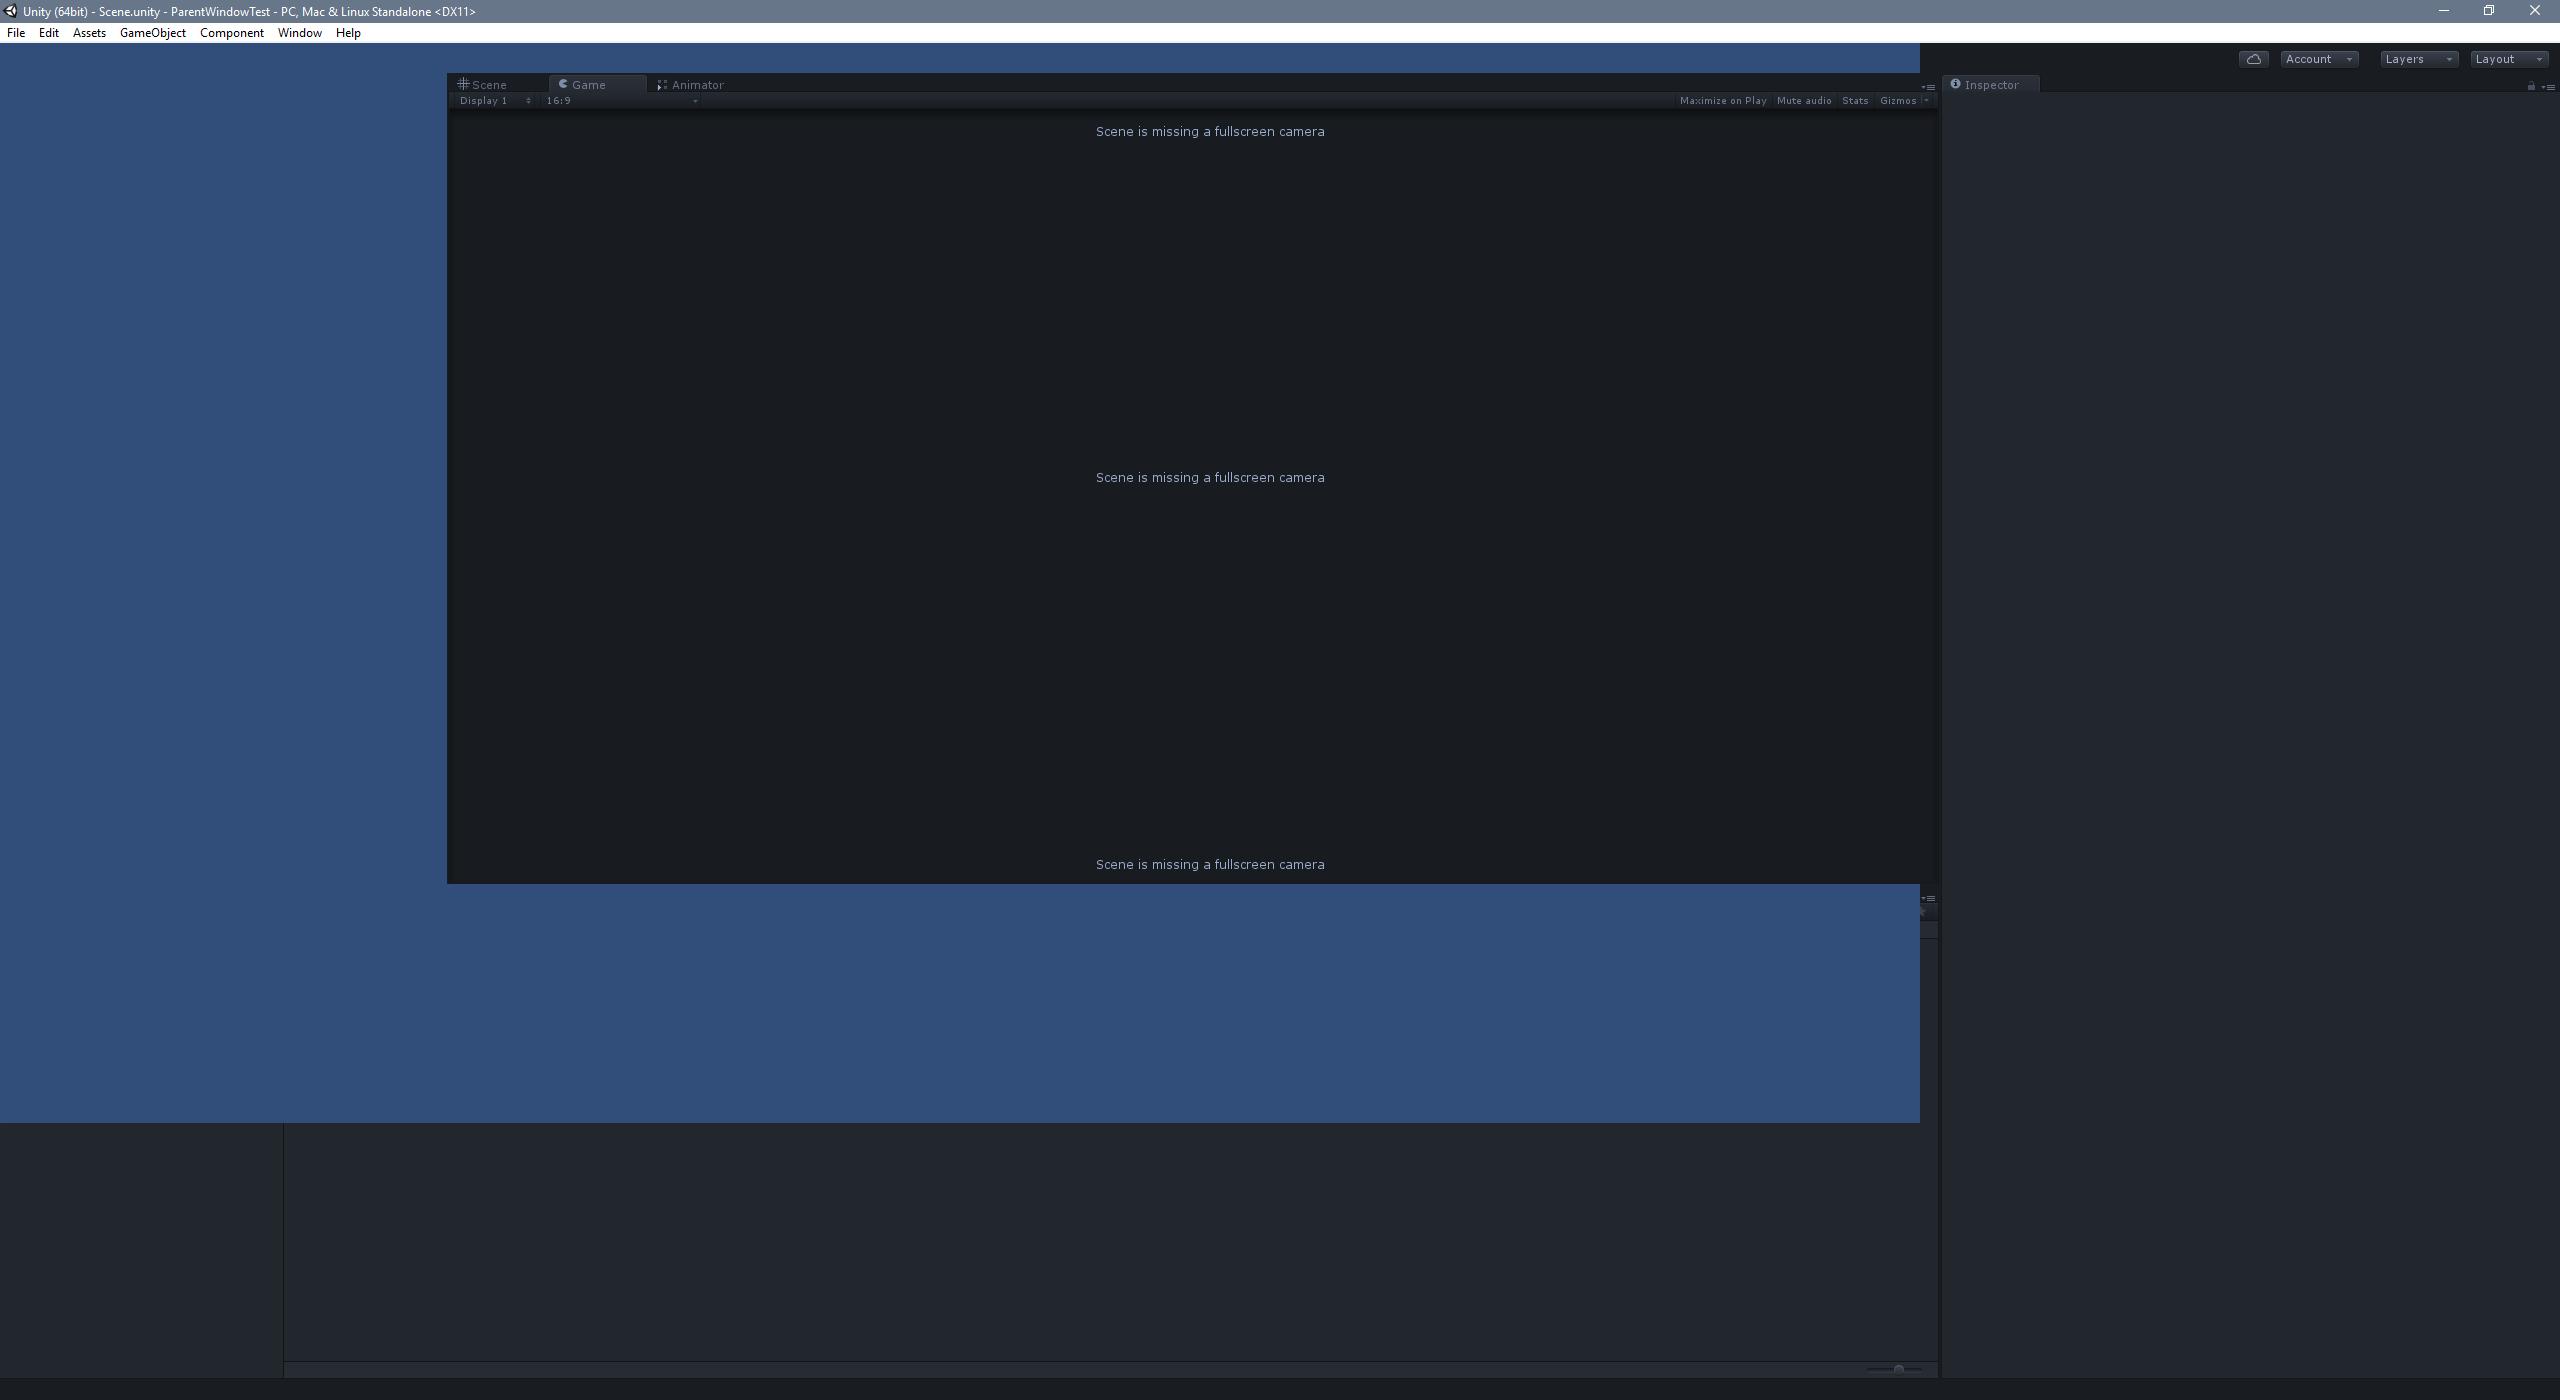 Display outside windows (like command-line application